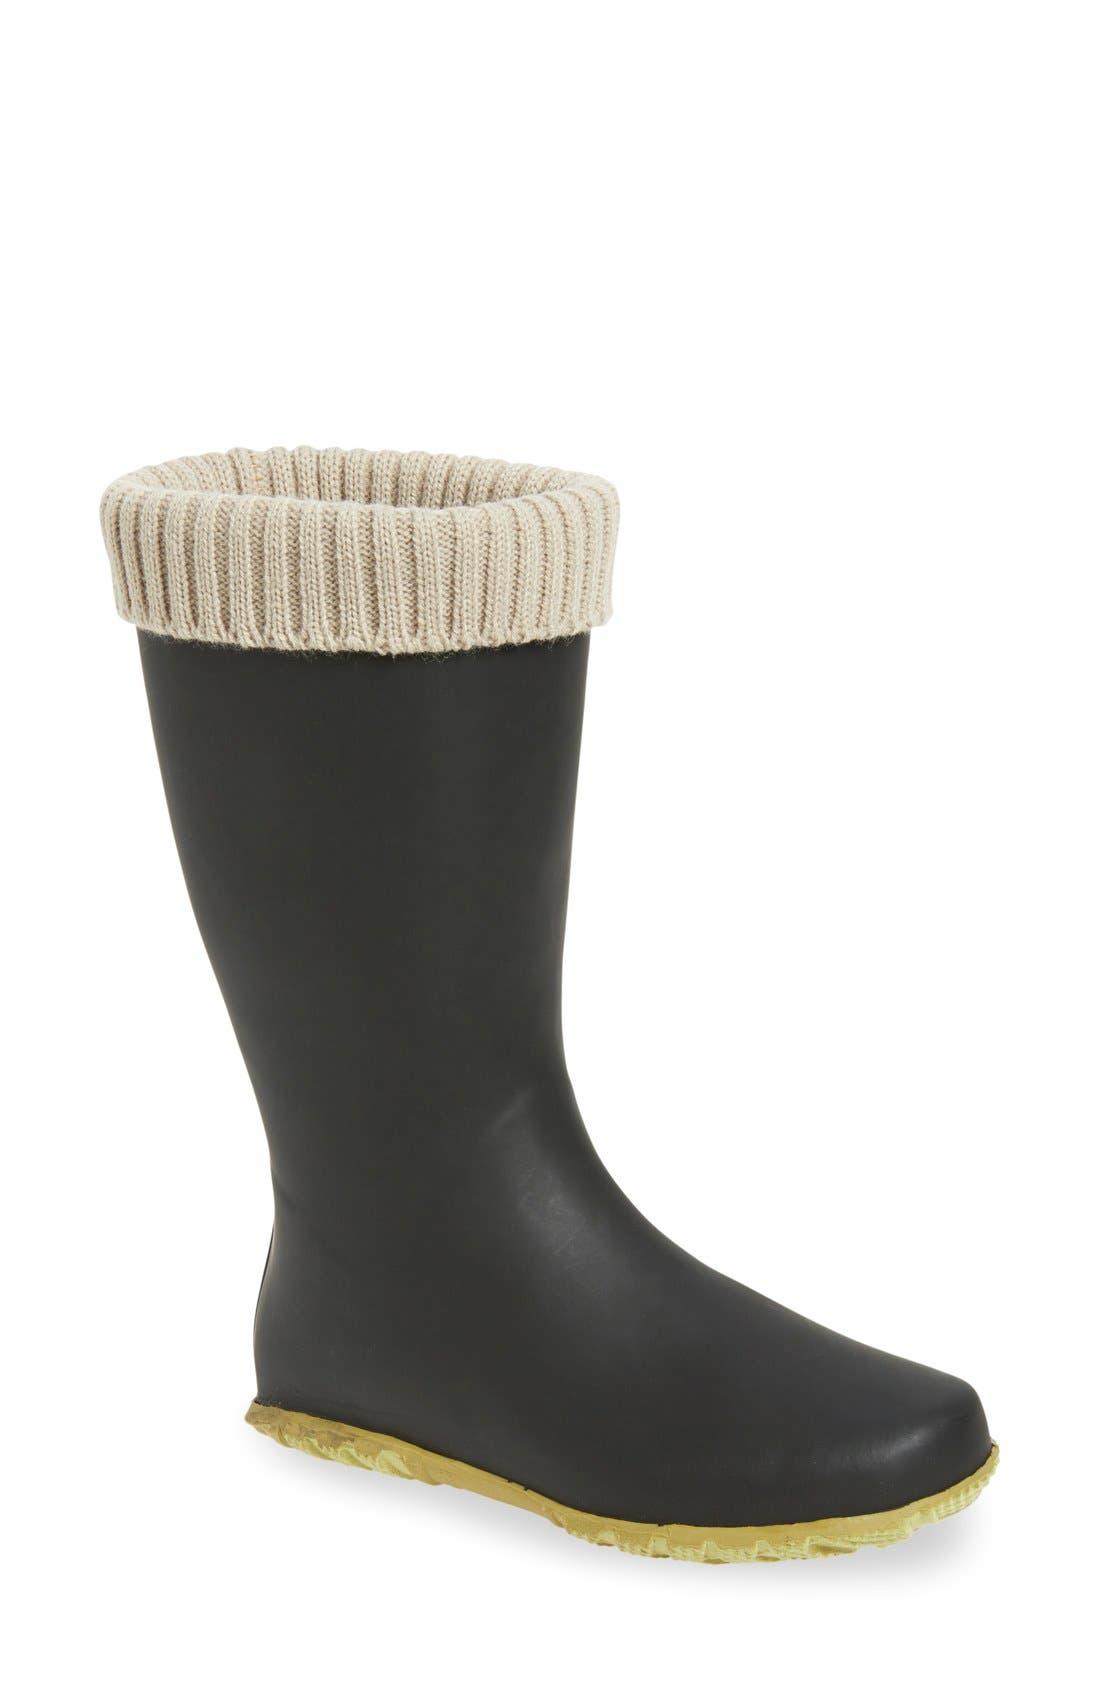 Weatherproof Rain Boot,                         Main,                         color, 001